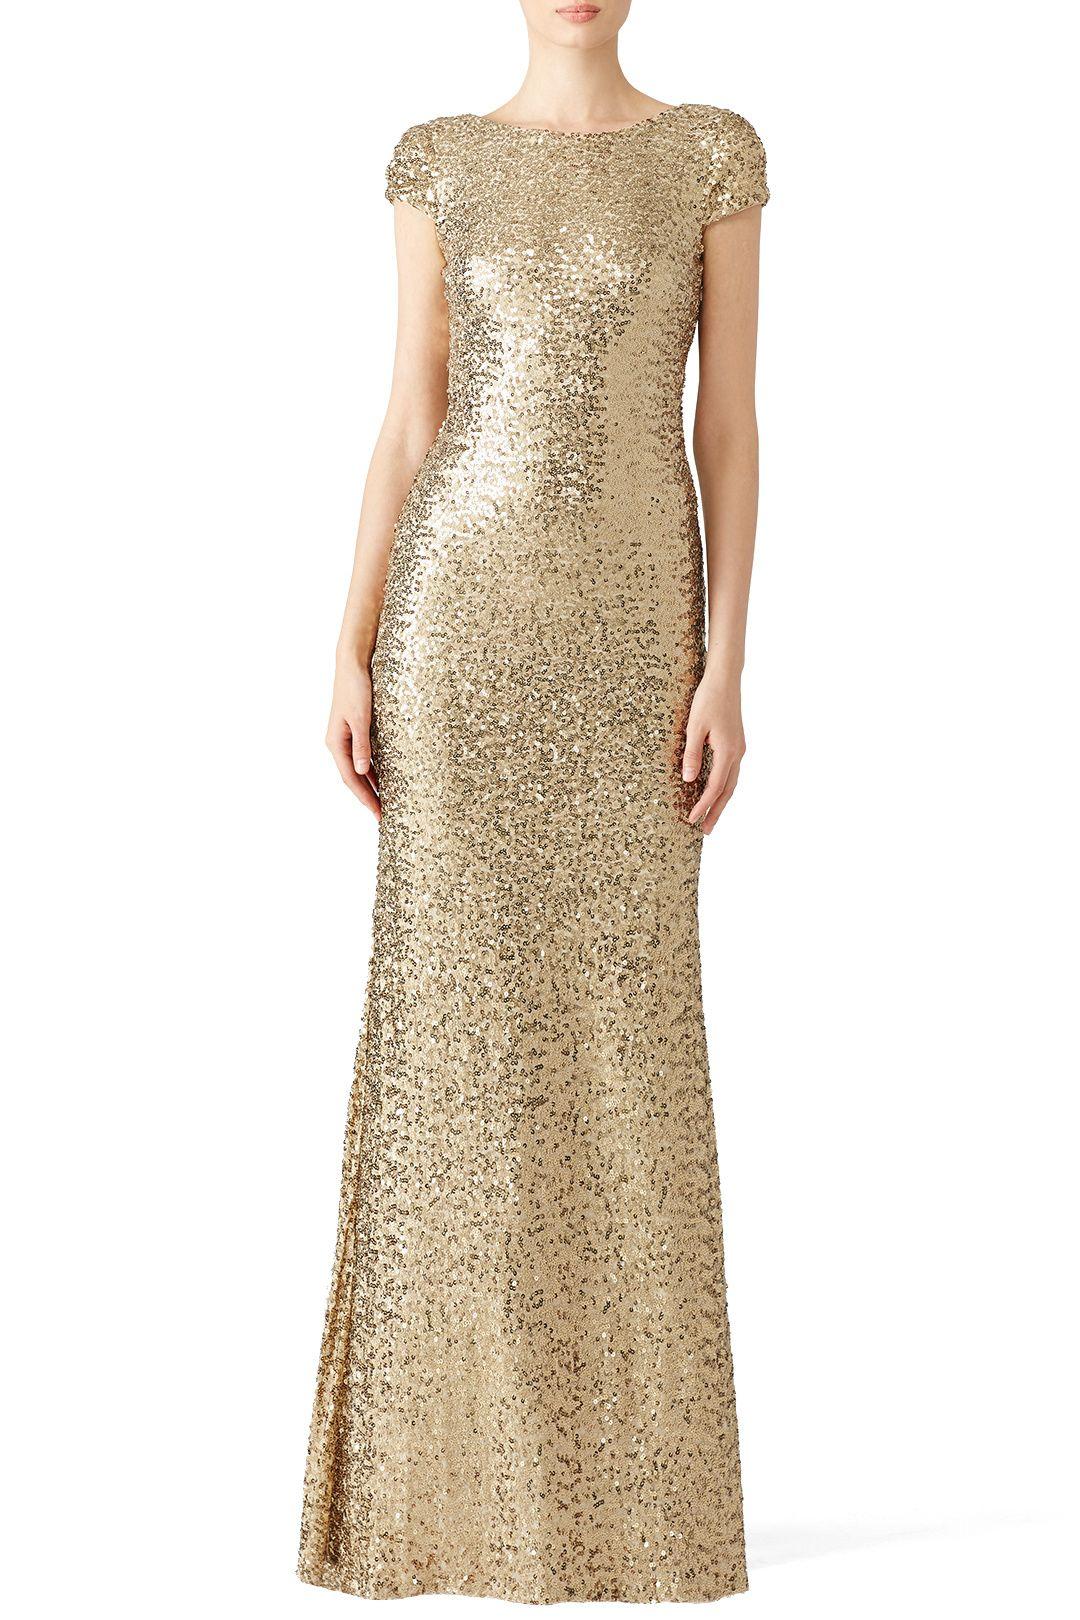 Gold Dress Rent the Runway